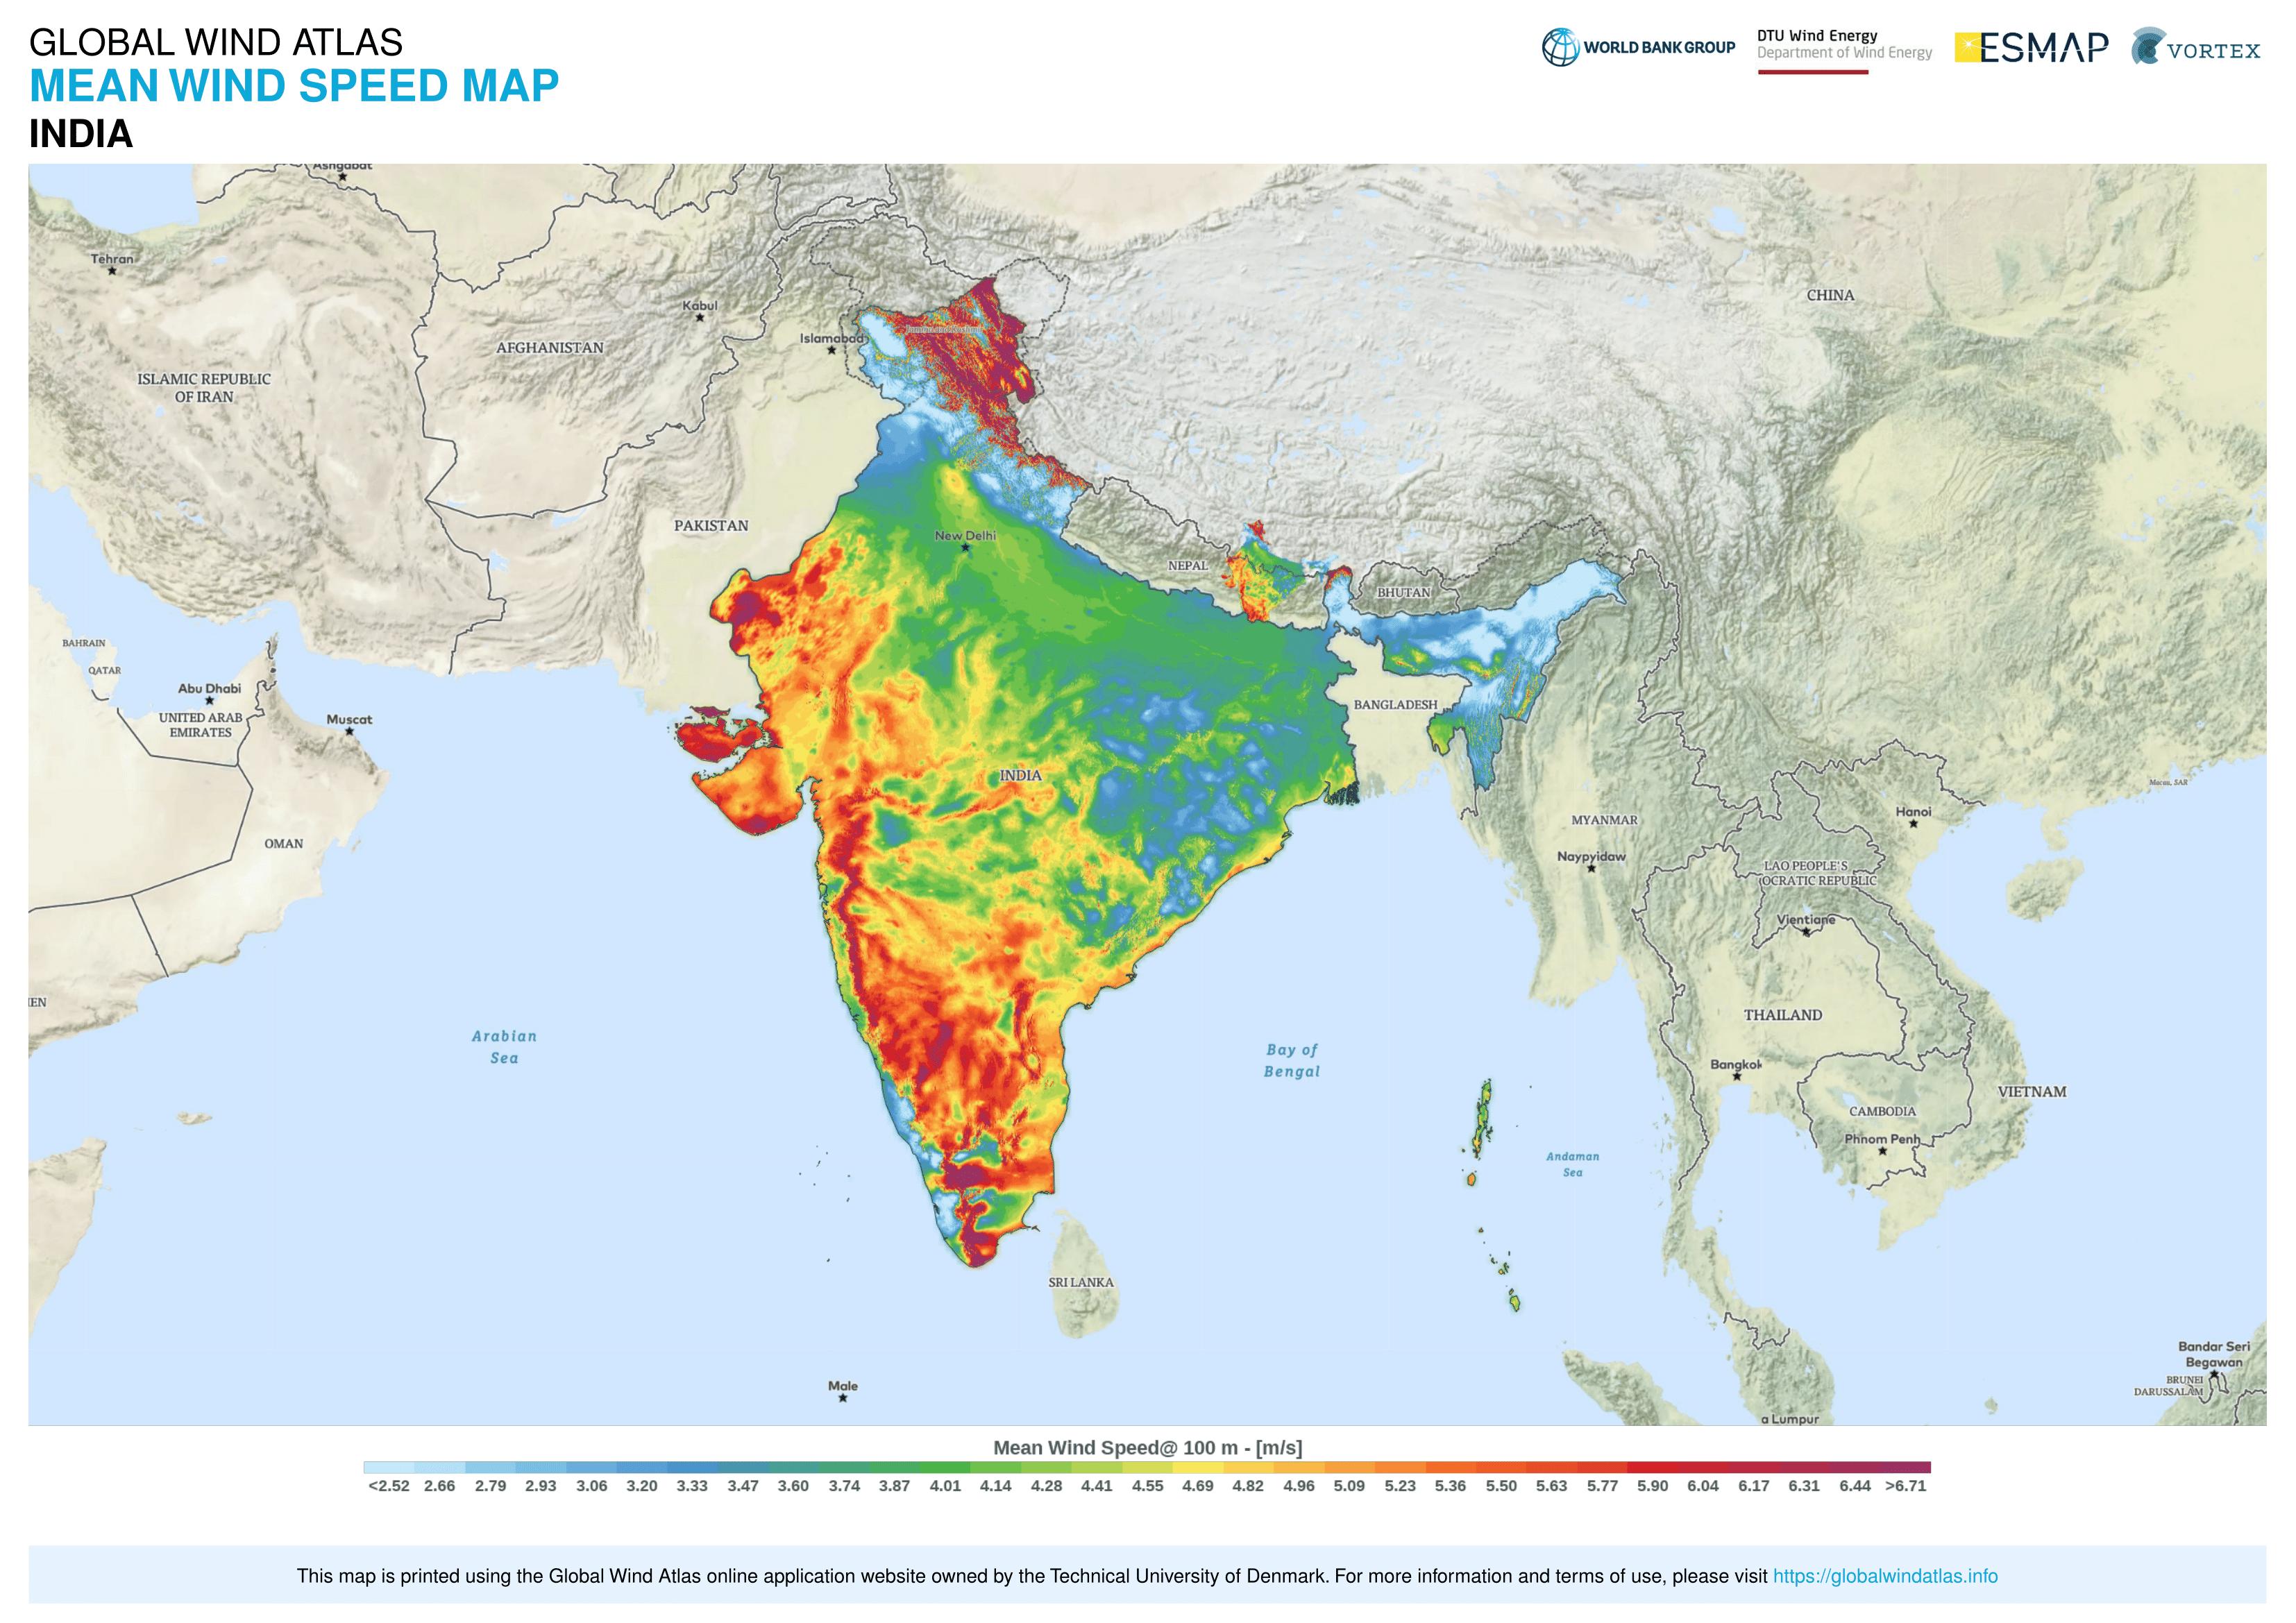 Wind power in India - Wikipedia